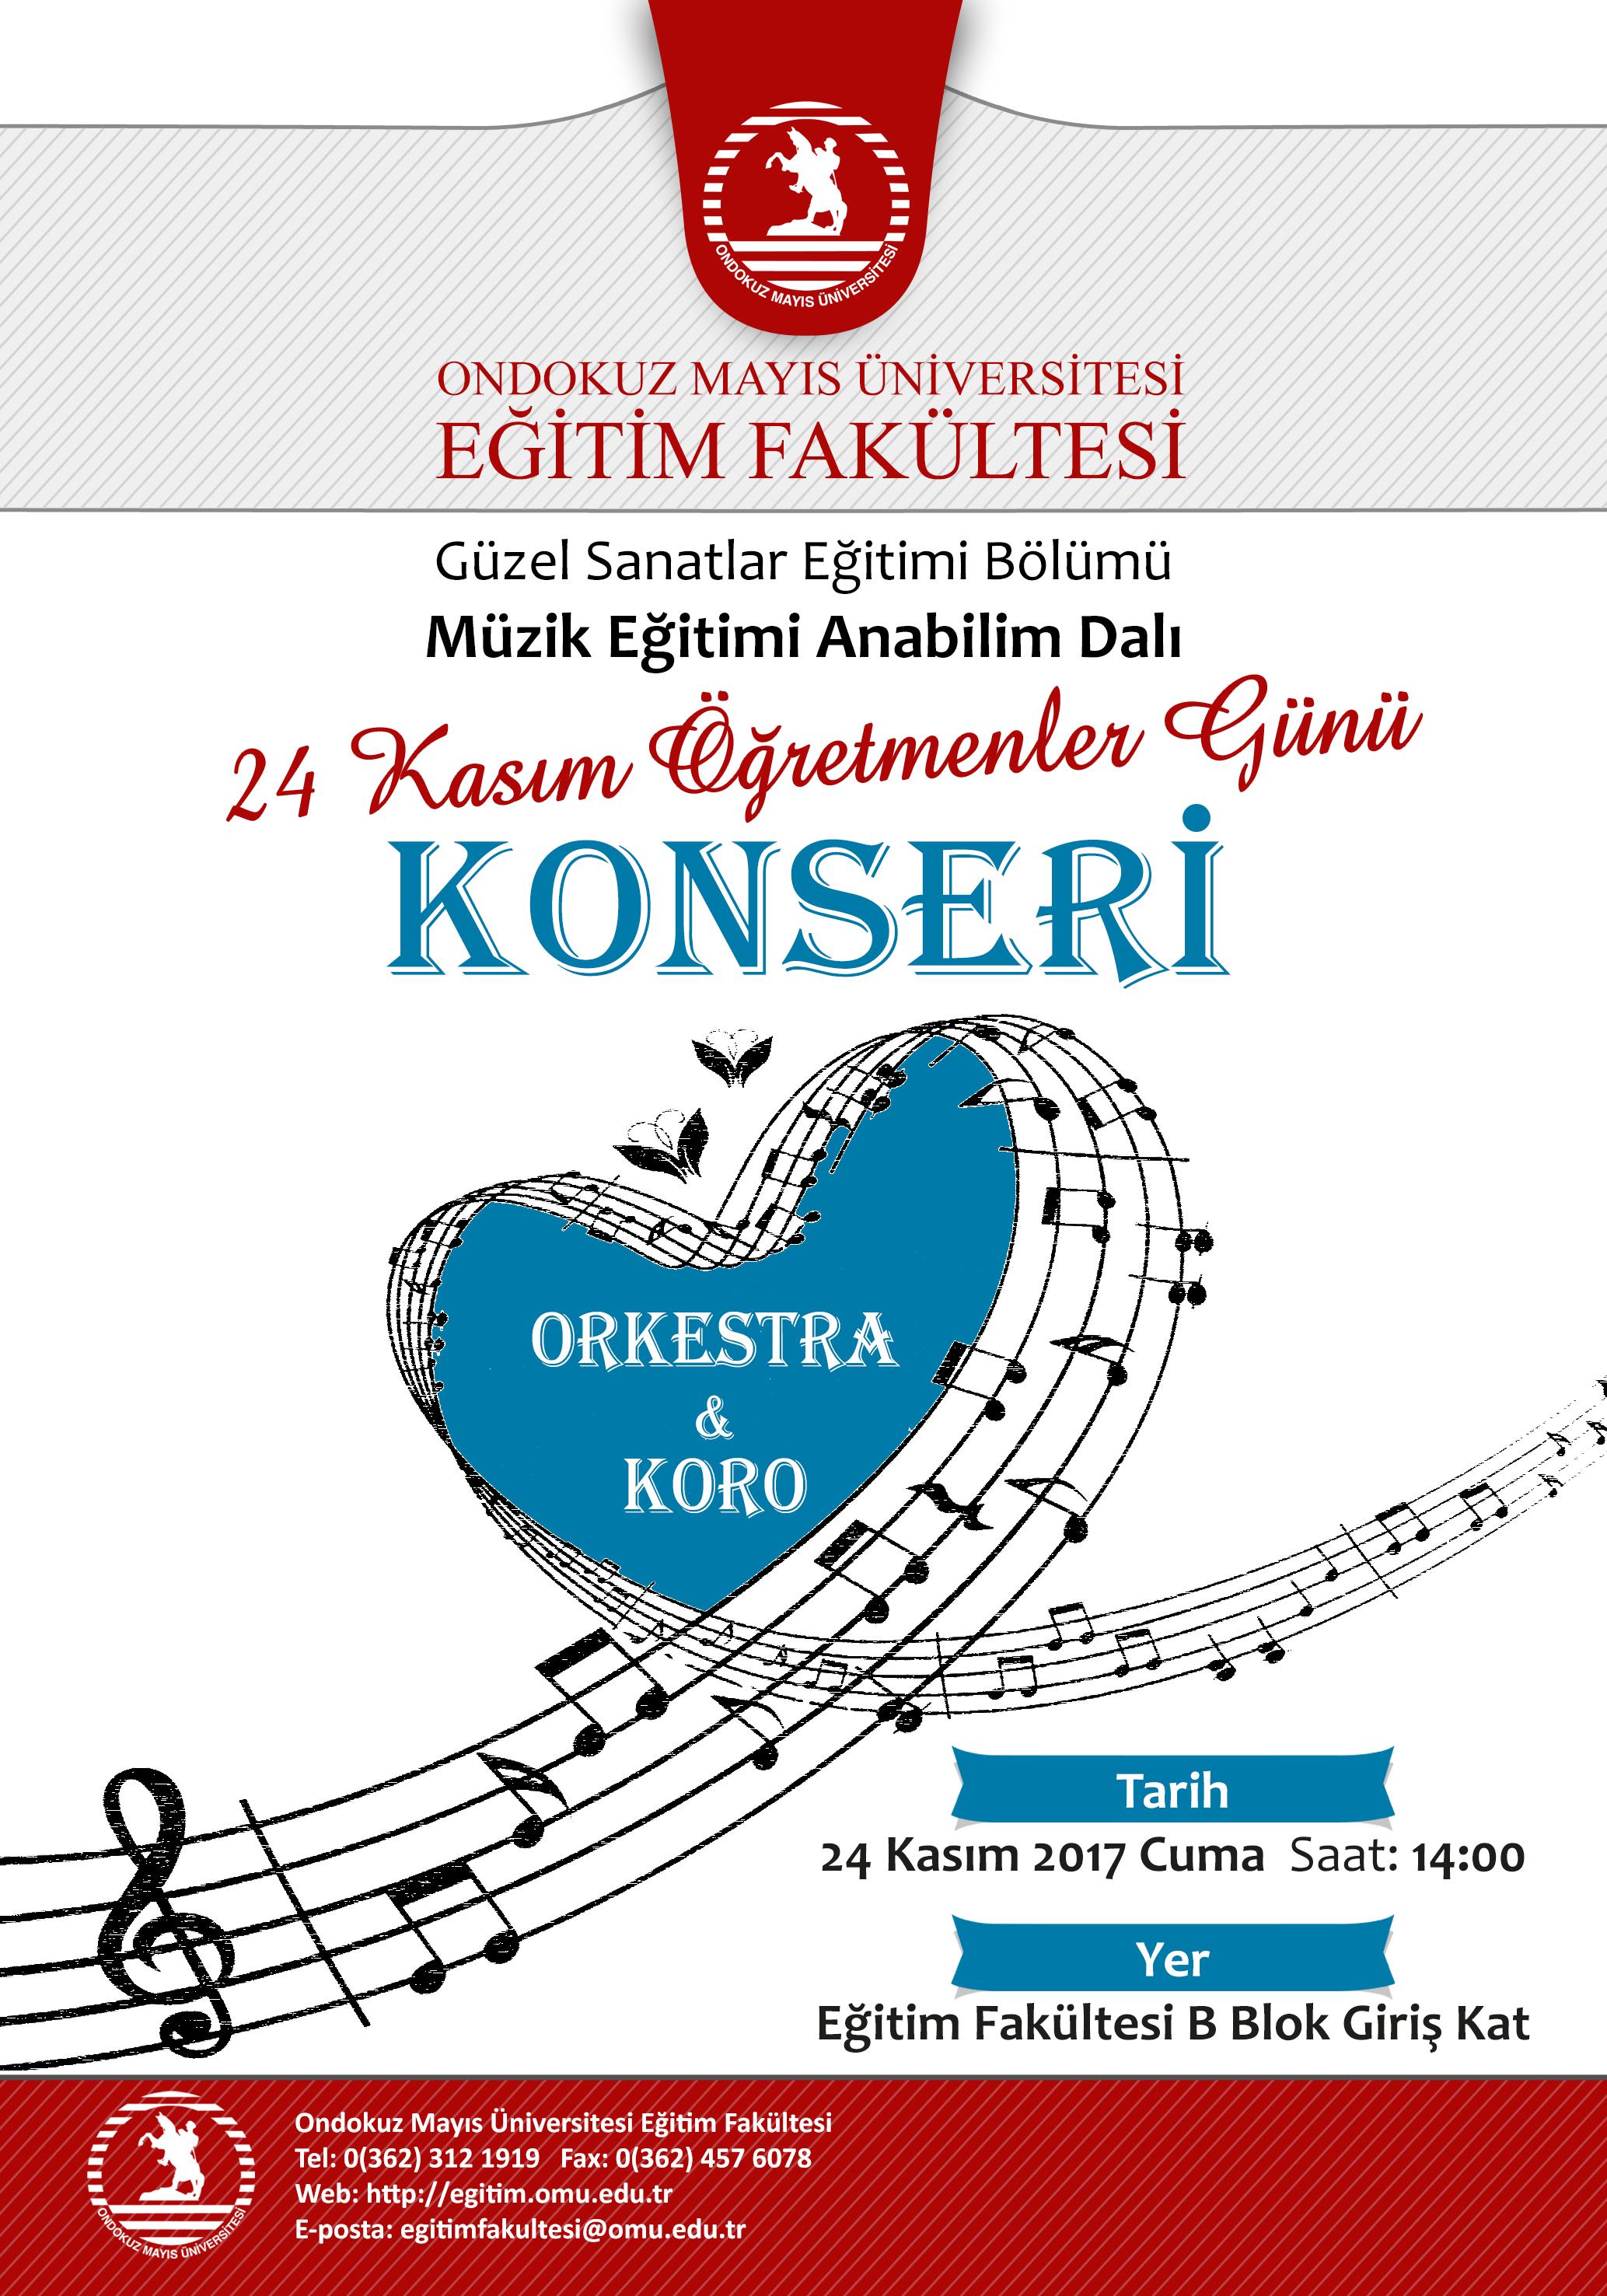 http://www.omu.edu.tr/sites/default/files/files/24_kasim_ogretmenler_gunu_konseri/muzik_egitimi_24_kasim_konseri.png